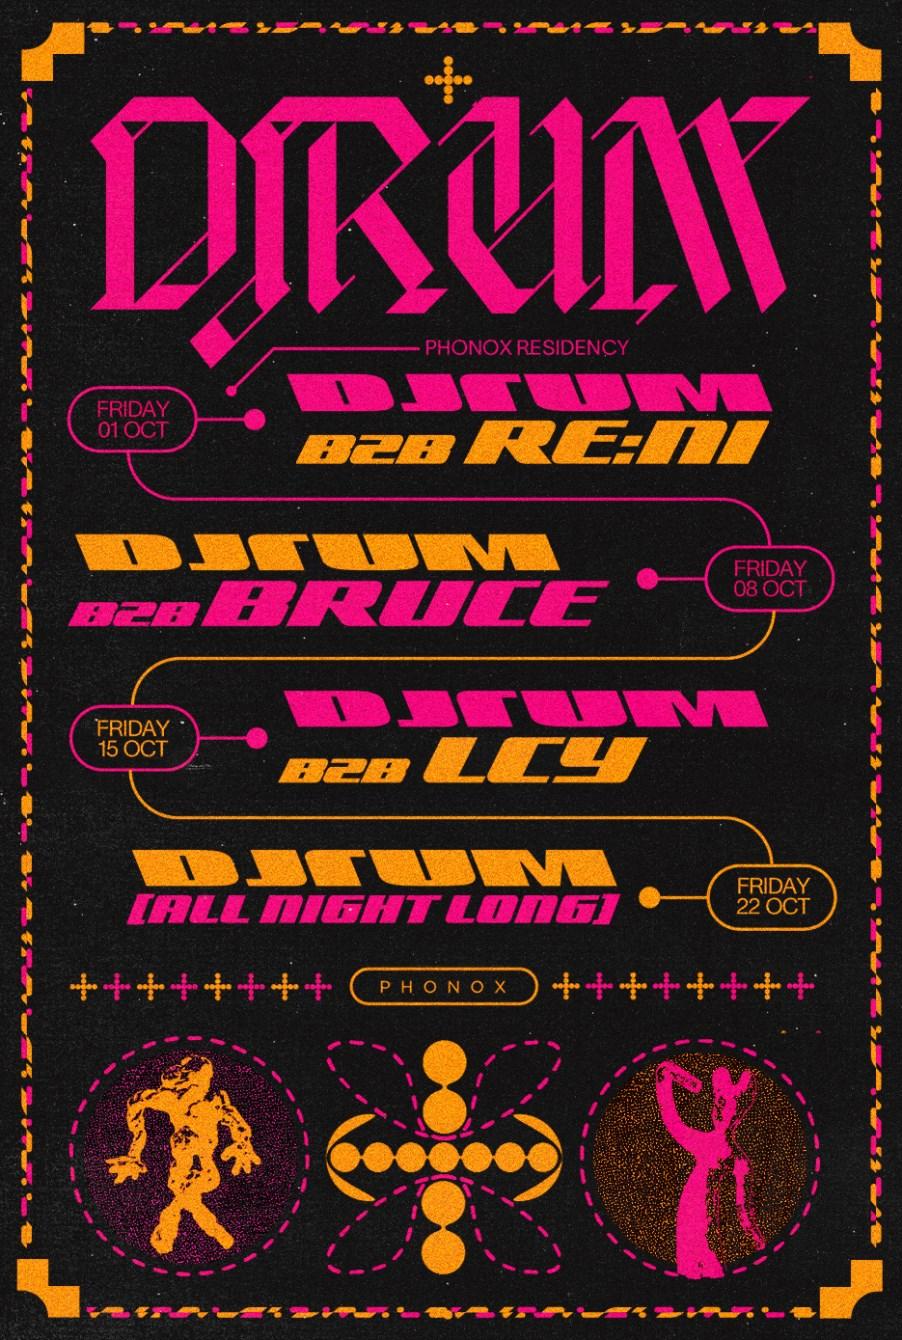 DjRUM (all Night Long) [4 Fridays at Phonox] - Flyer front